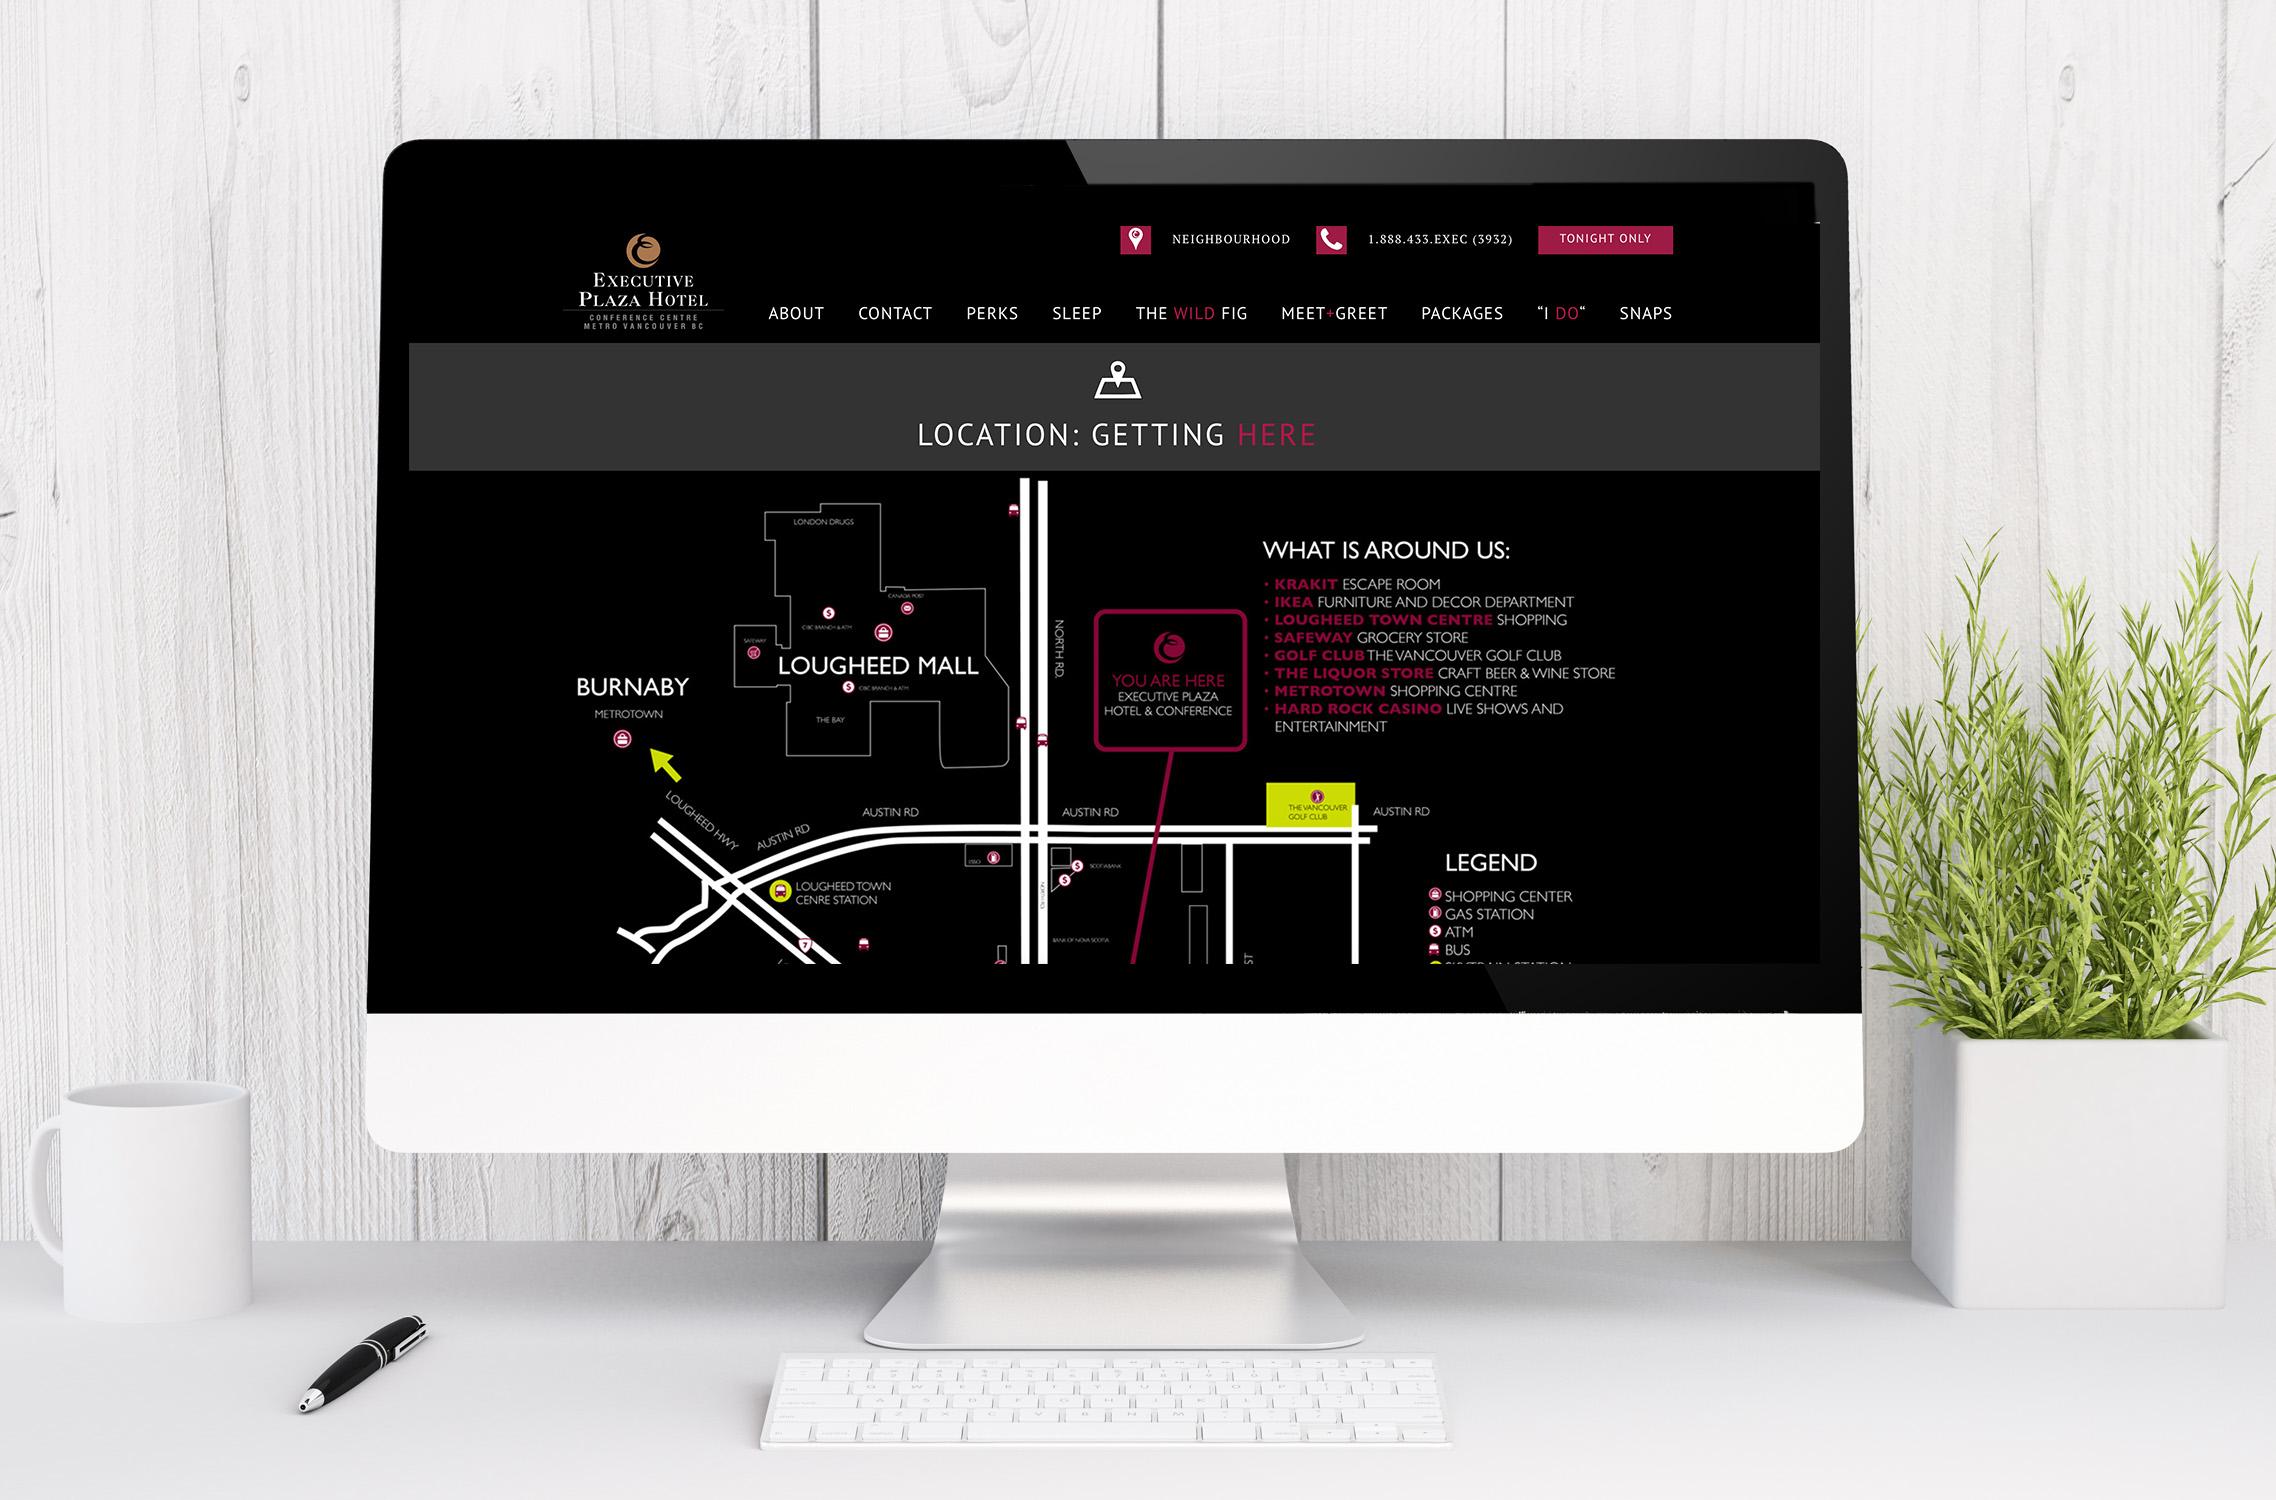 ExecutiveHotel_Map_Mockup.jpg